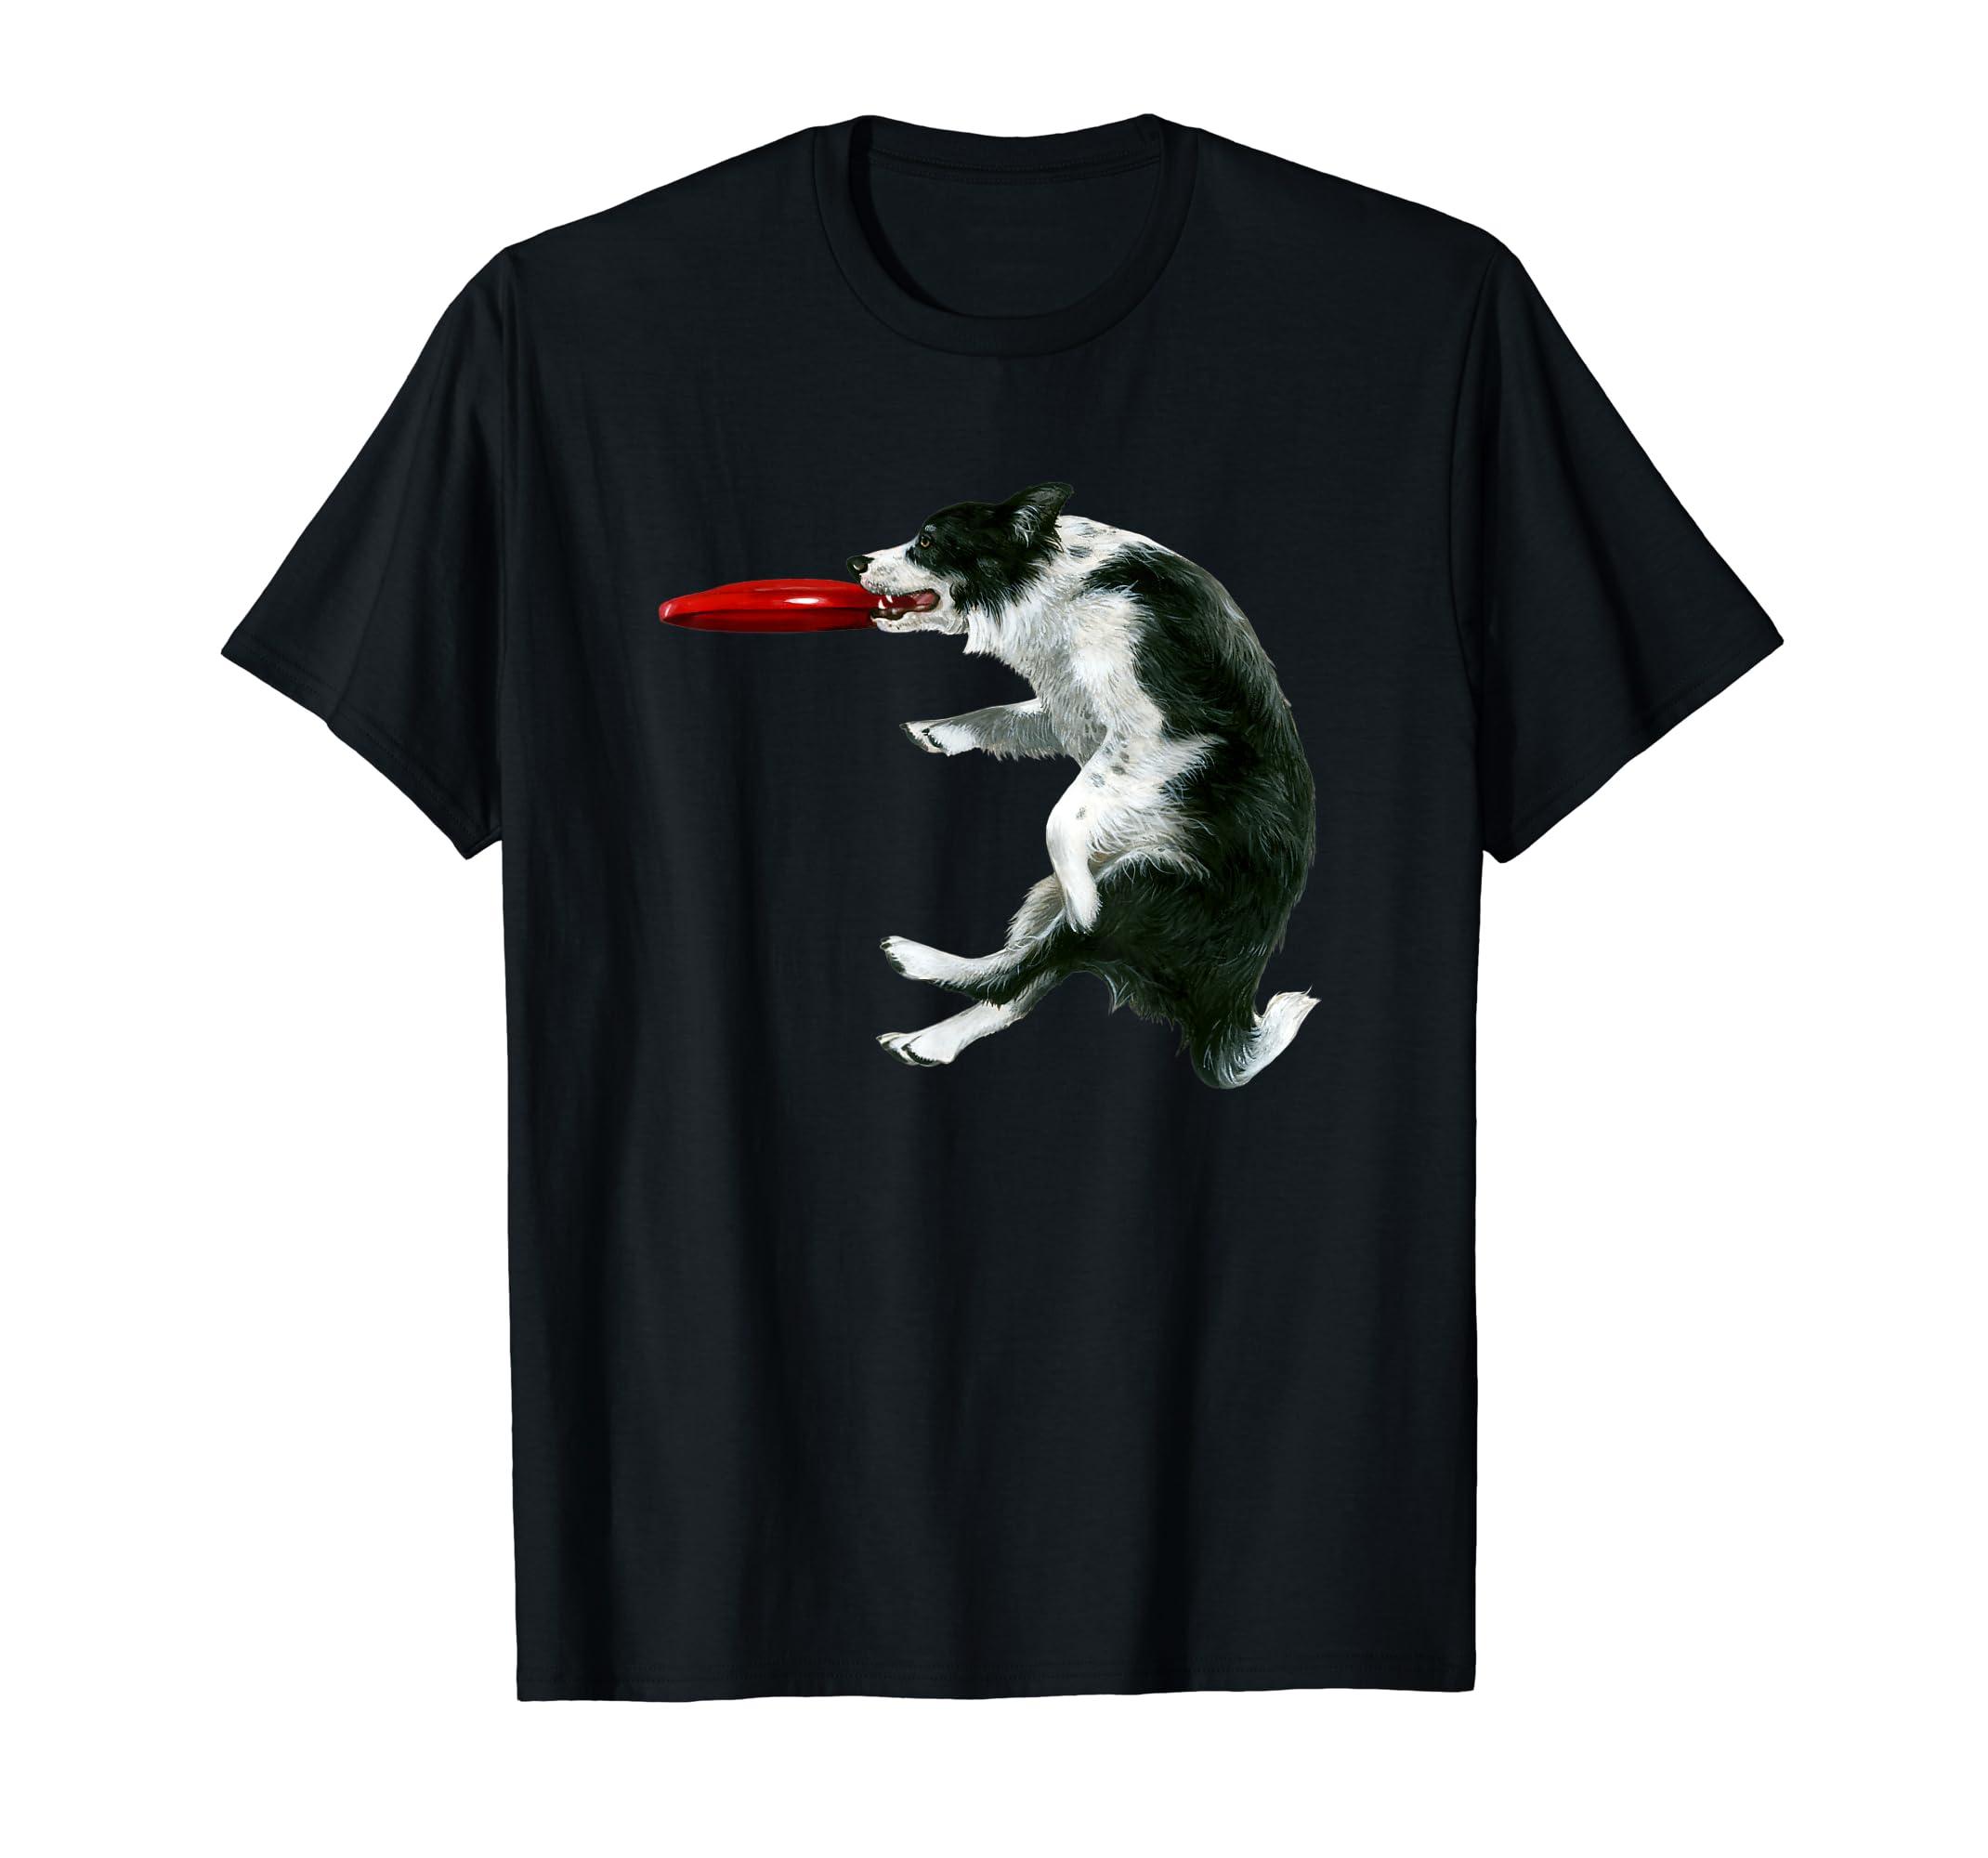 Border Collie Frisbee Shirt Sheepdog Shirt Gift-Men's T-Shirt-Black